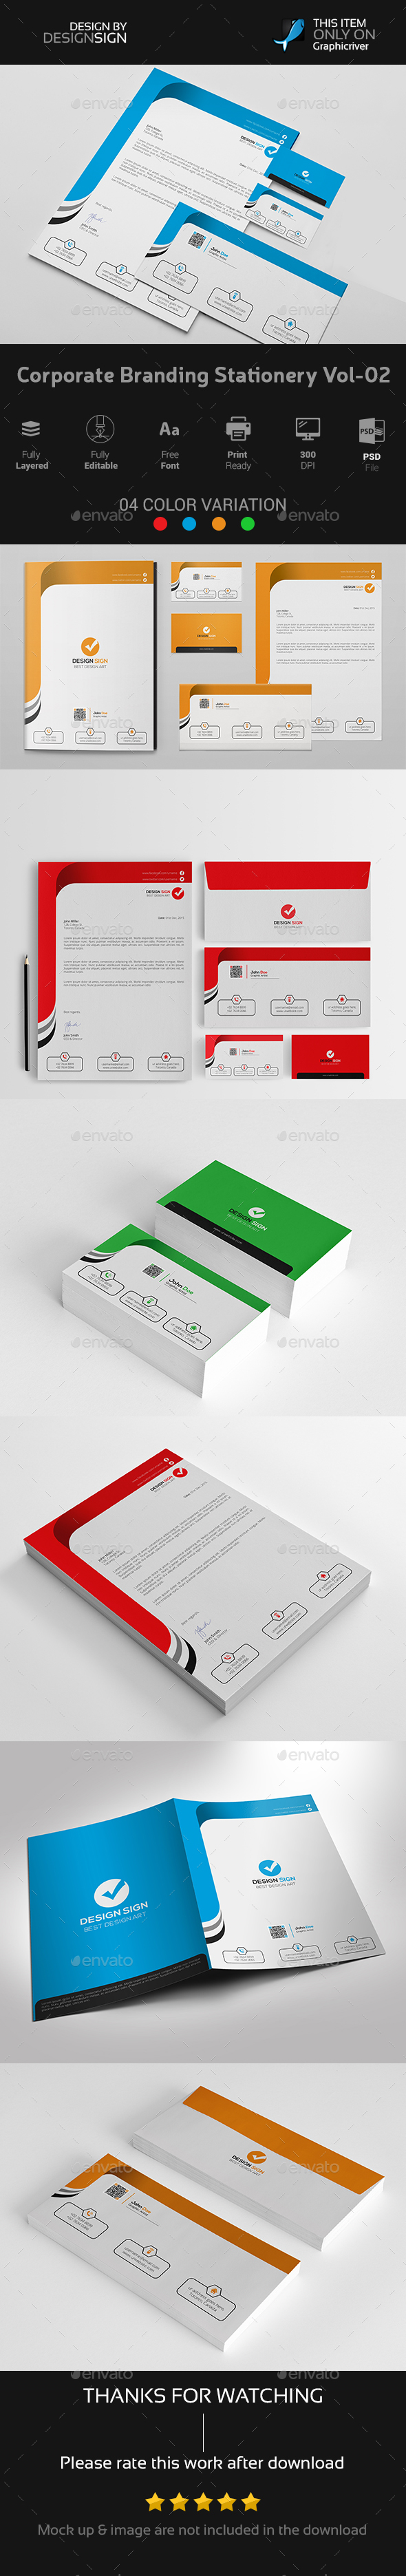 Corporate Branding Stationery Vol-02 - Stationery Print Templates